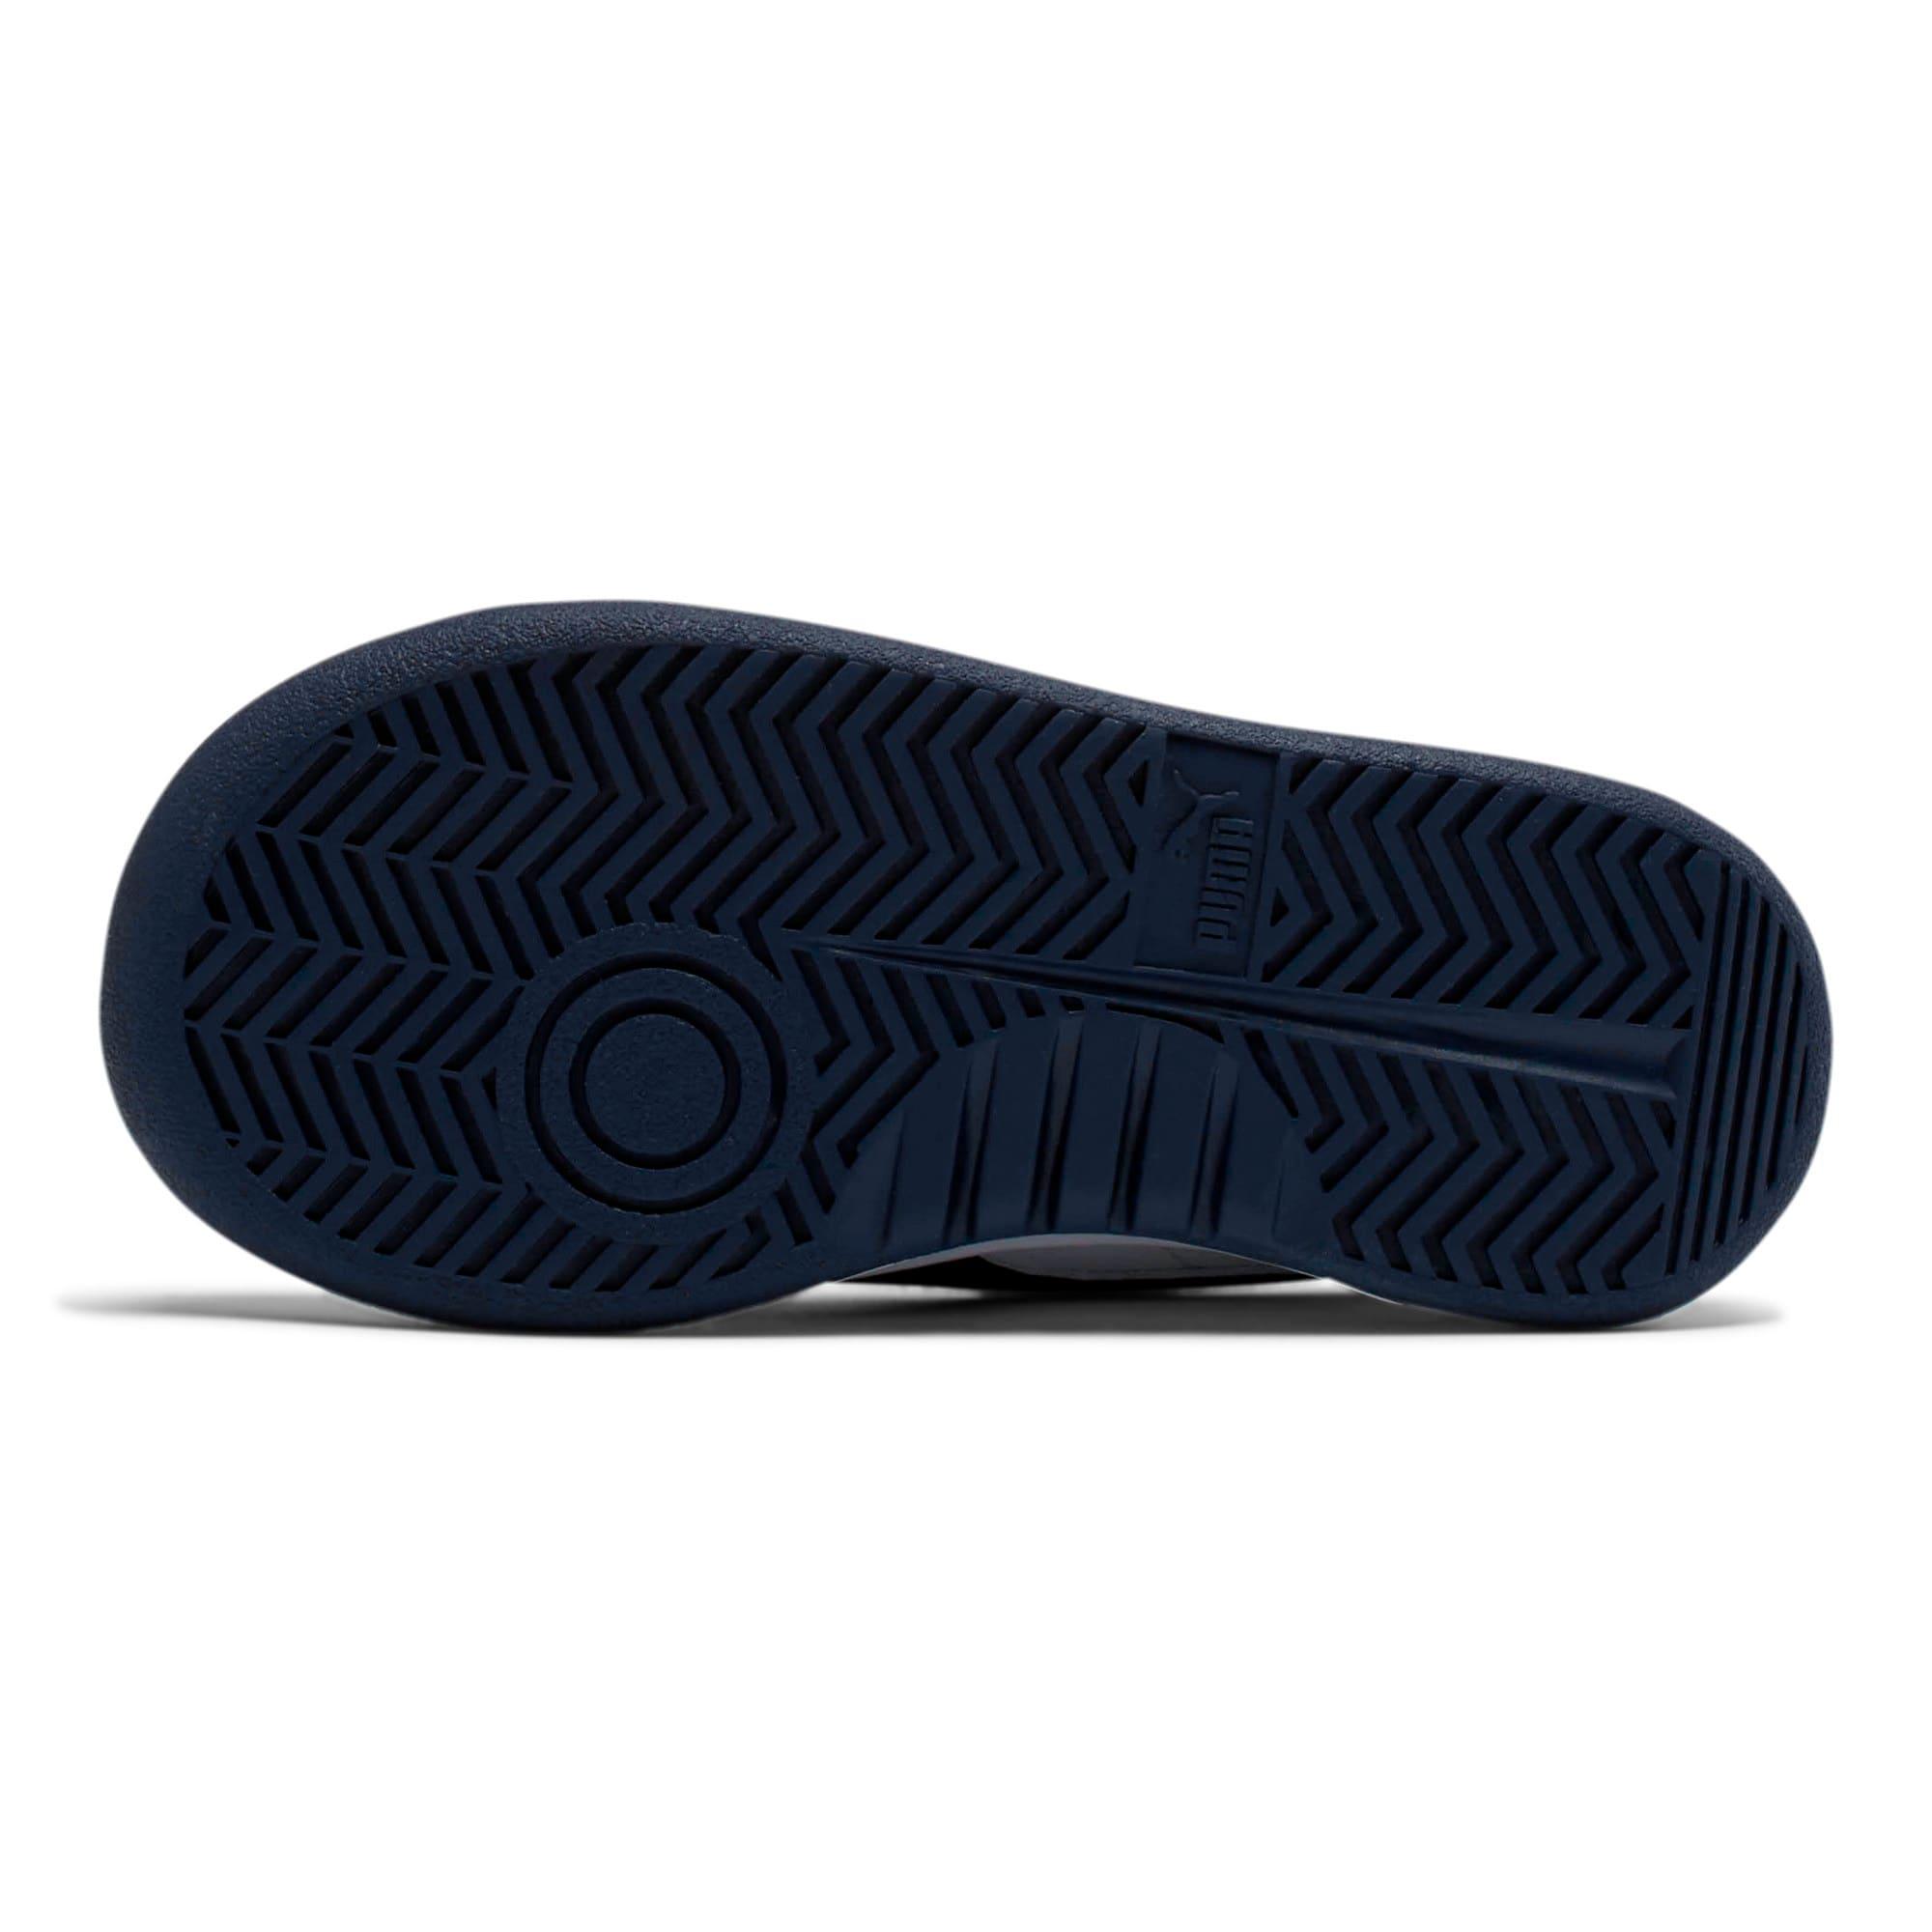 Thumbnail 3 of GV Special Little Kids' Shoes, Puma White-Peacoat, medium